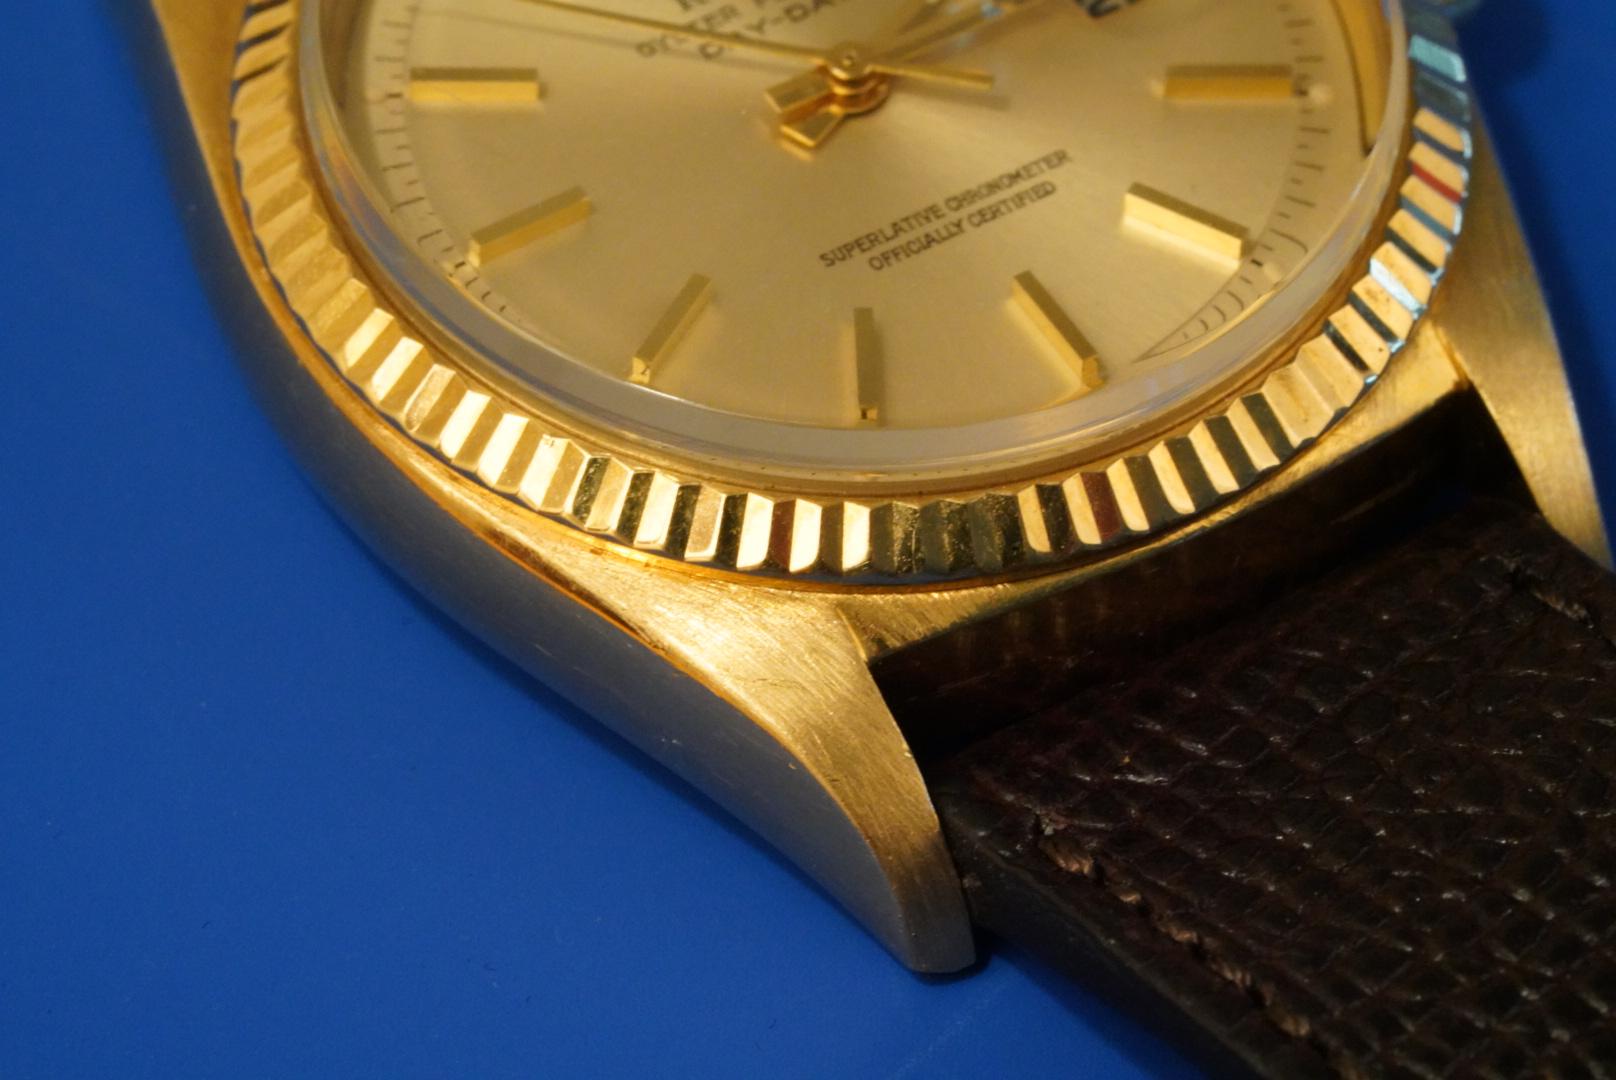 Rolex Day-Date-11.jpg